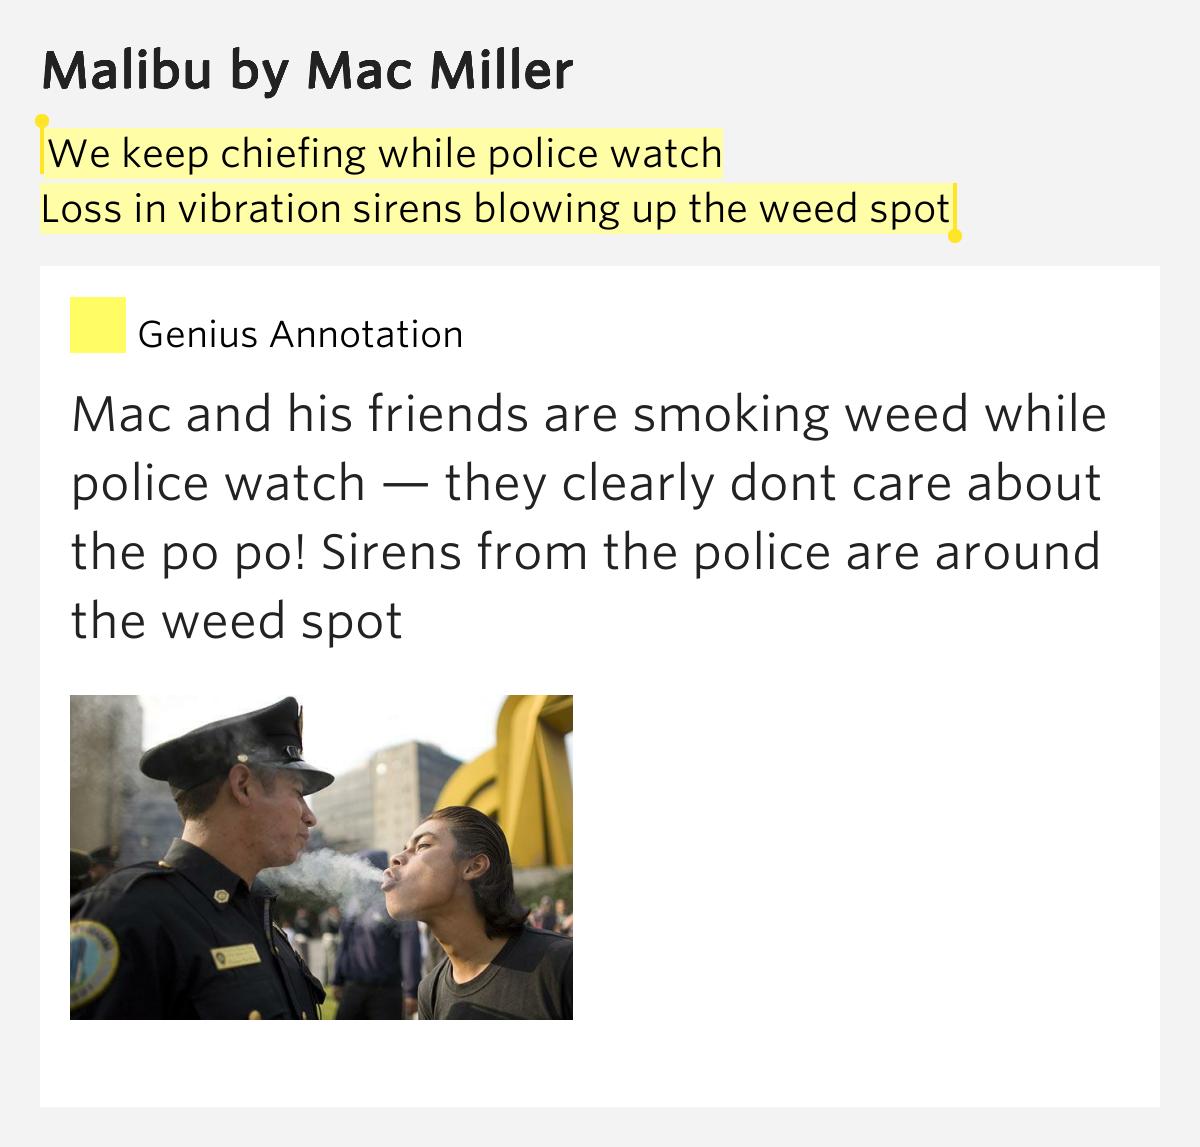 Mac Miller - Malibu - YouTube